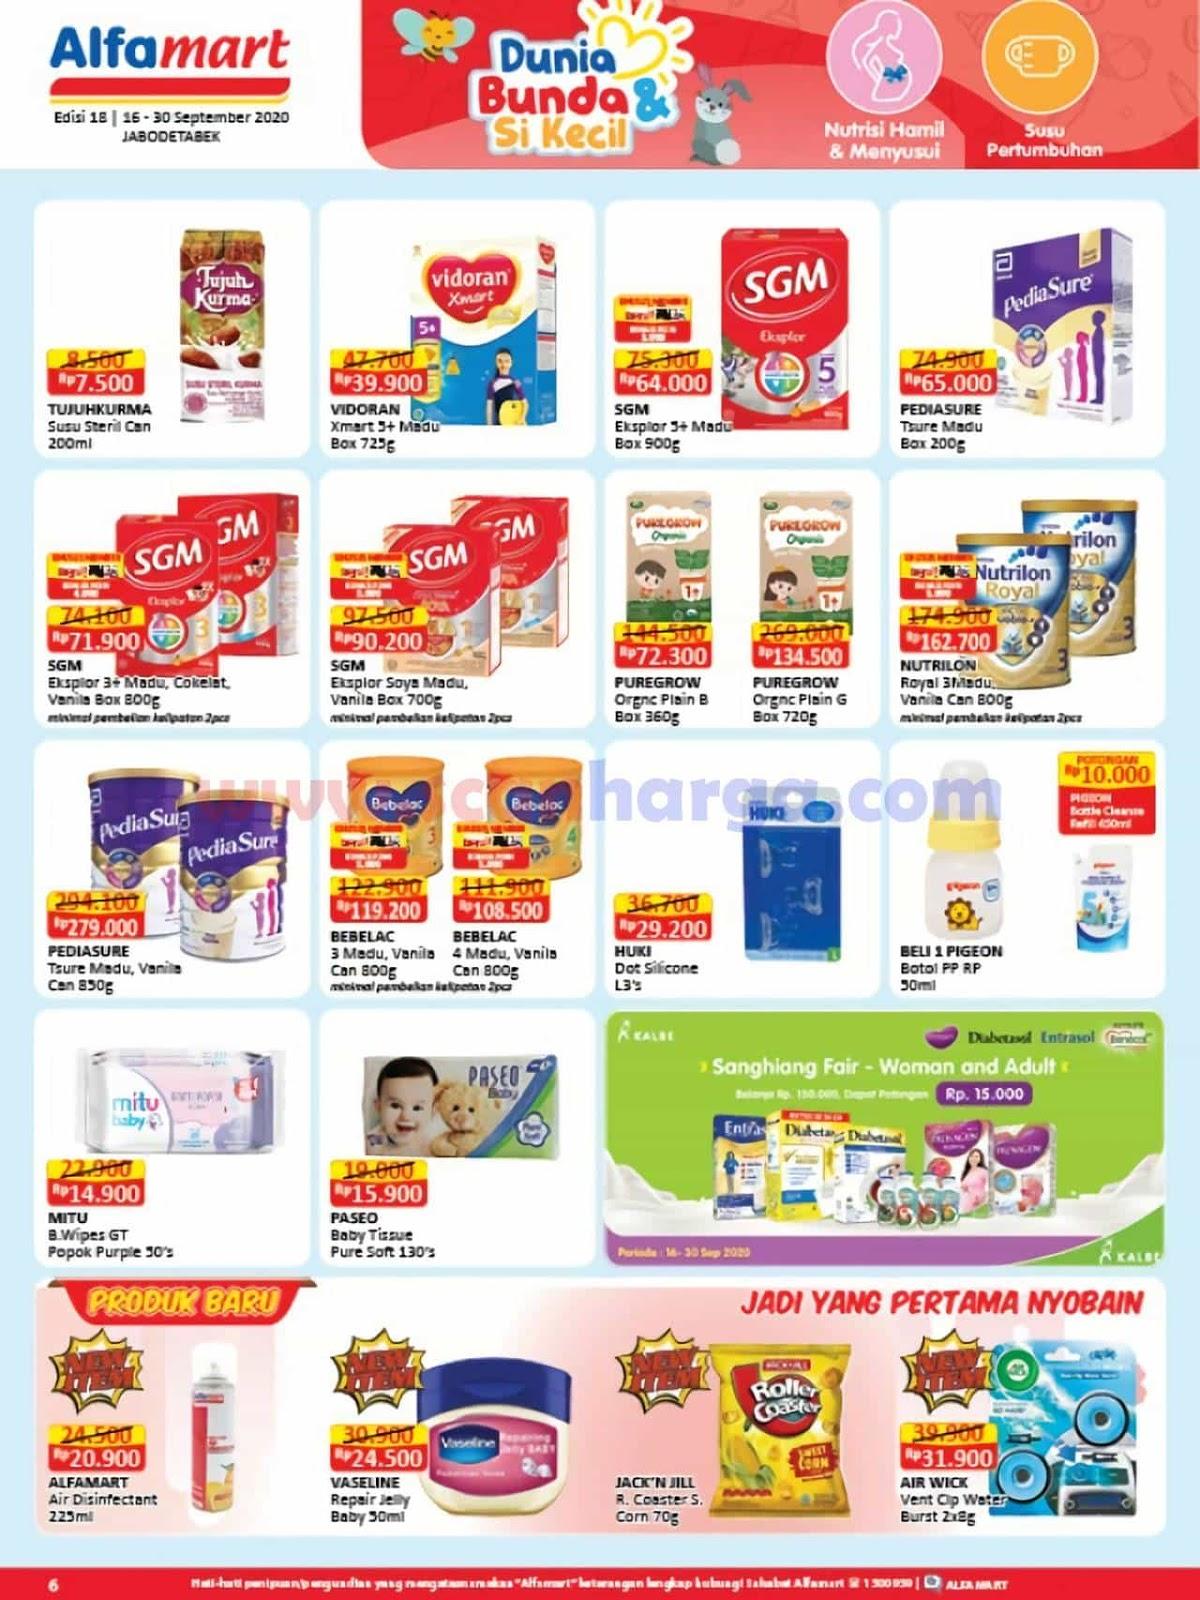 Katalog Promo Alfamart 16 - 30 September 2020 6